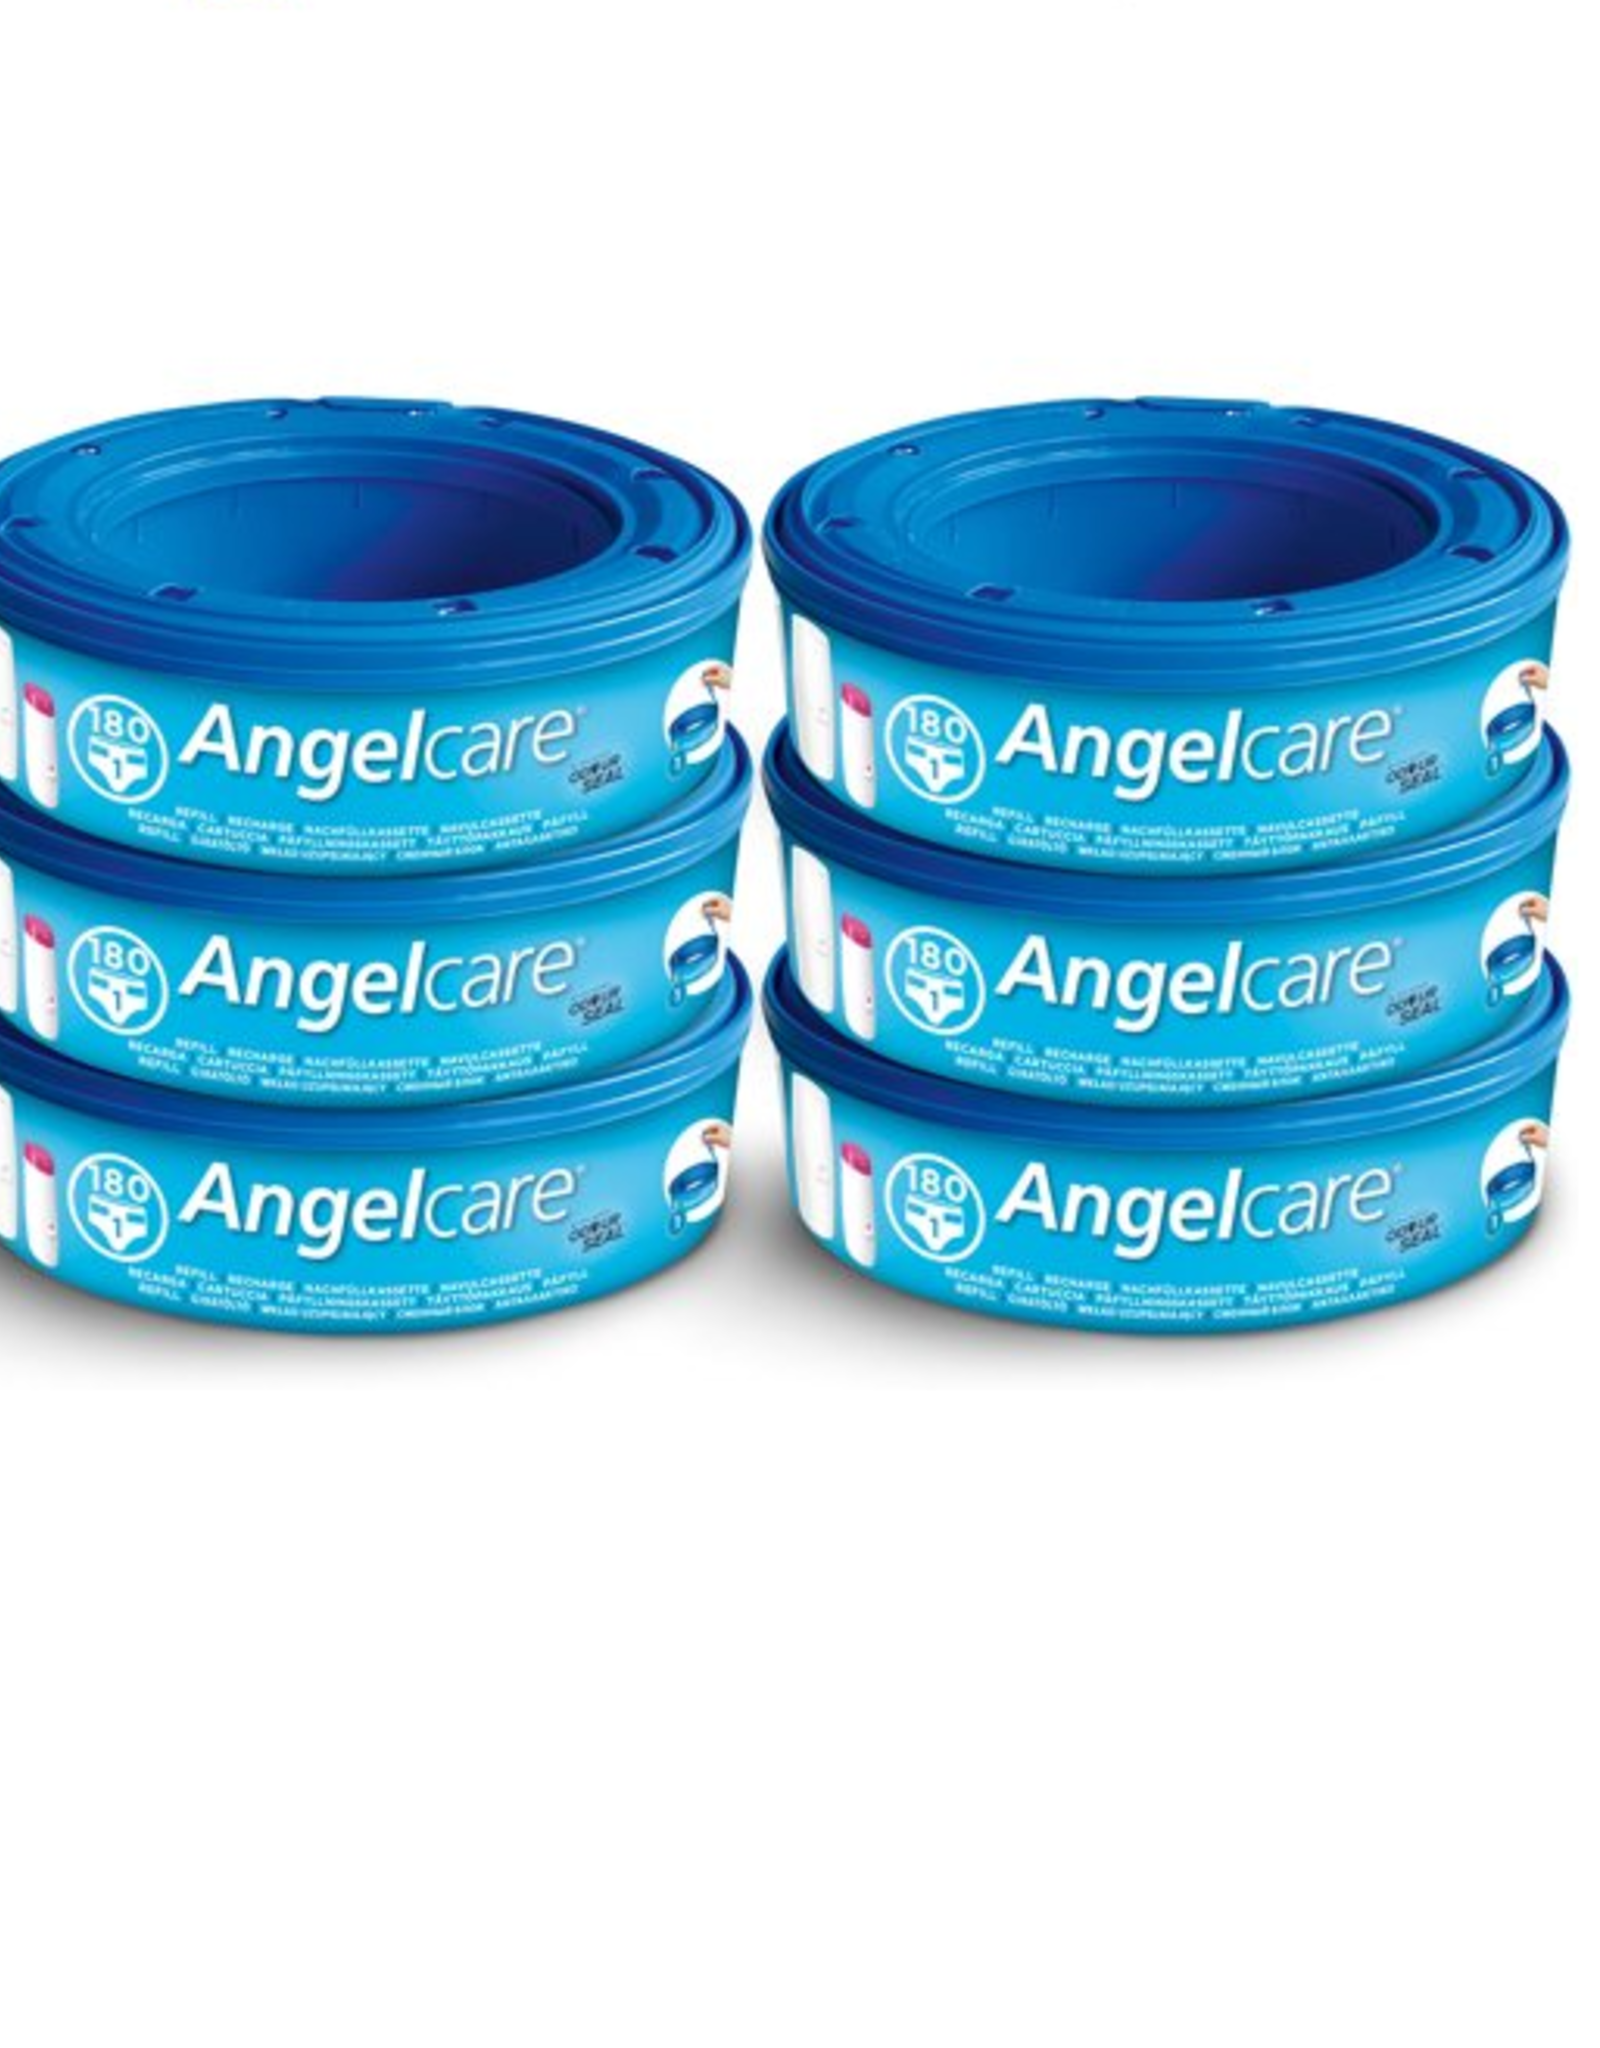 Angelcare 6 lLieremmervullingen blauw